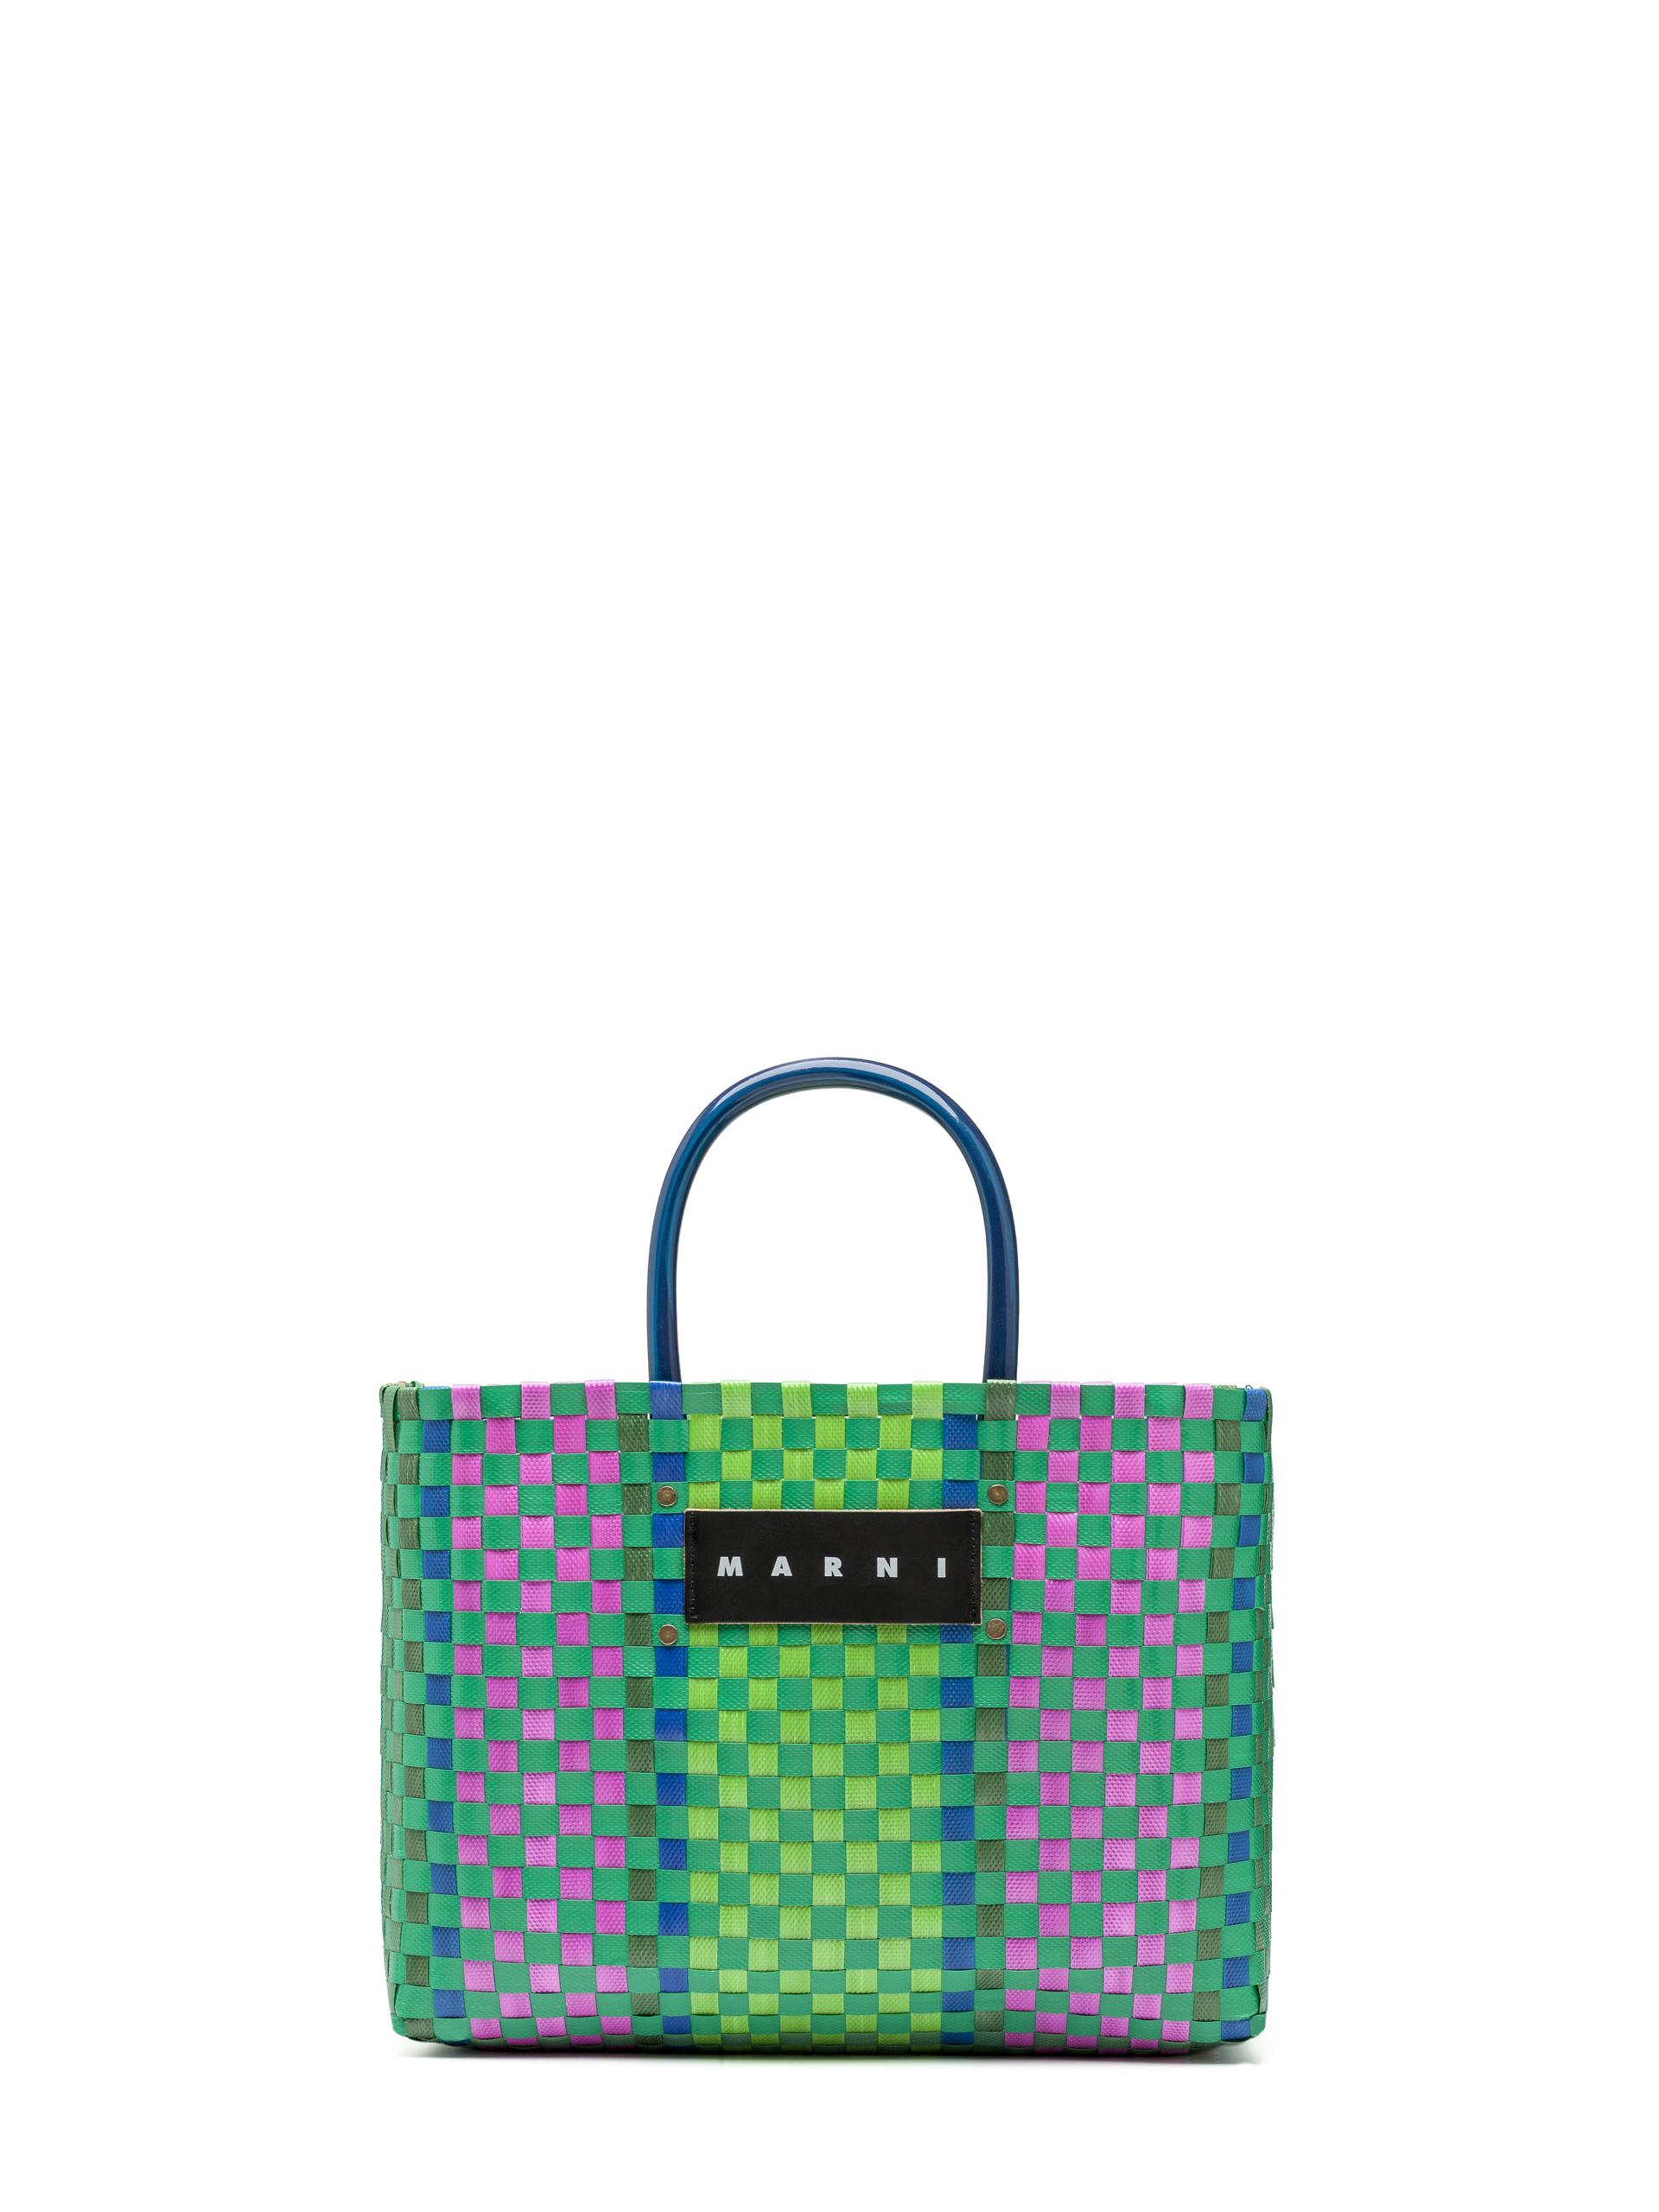 Marni - Marni Market - Rinascente - Basket Bag